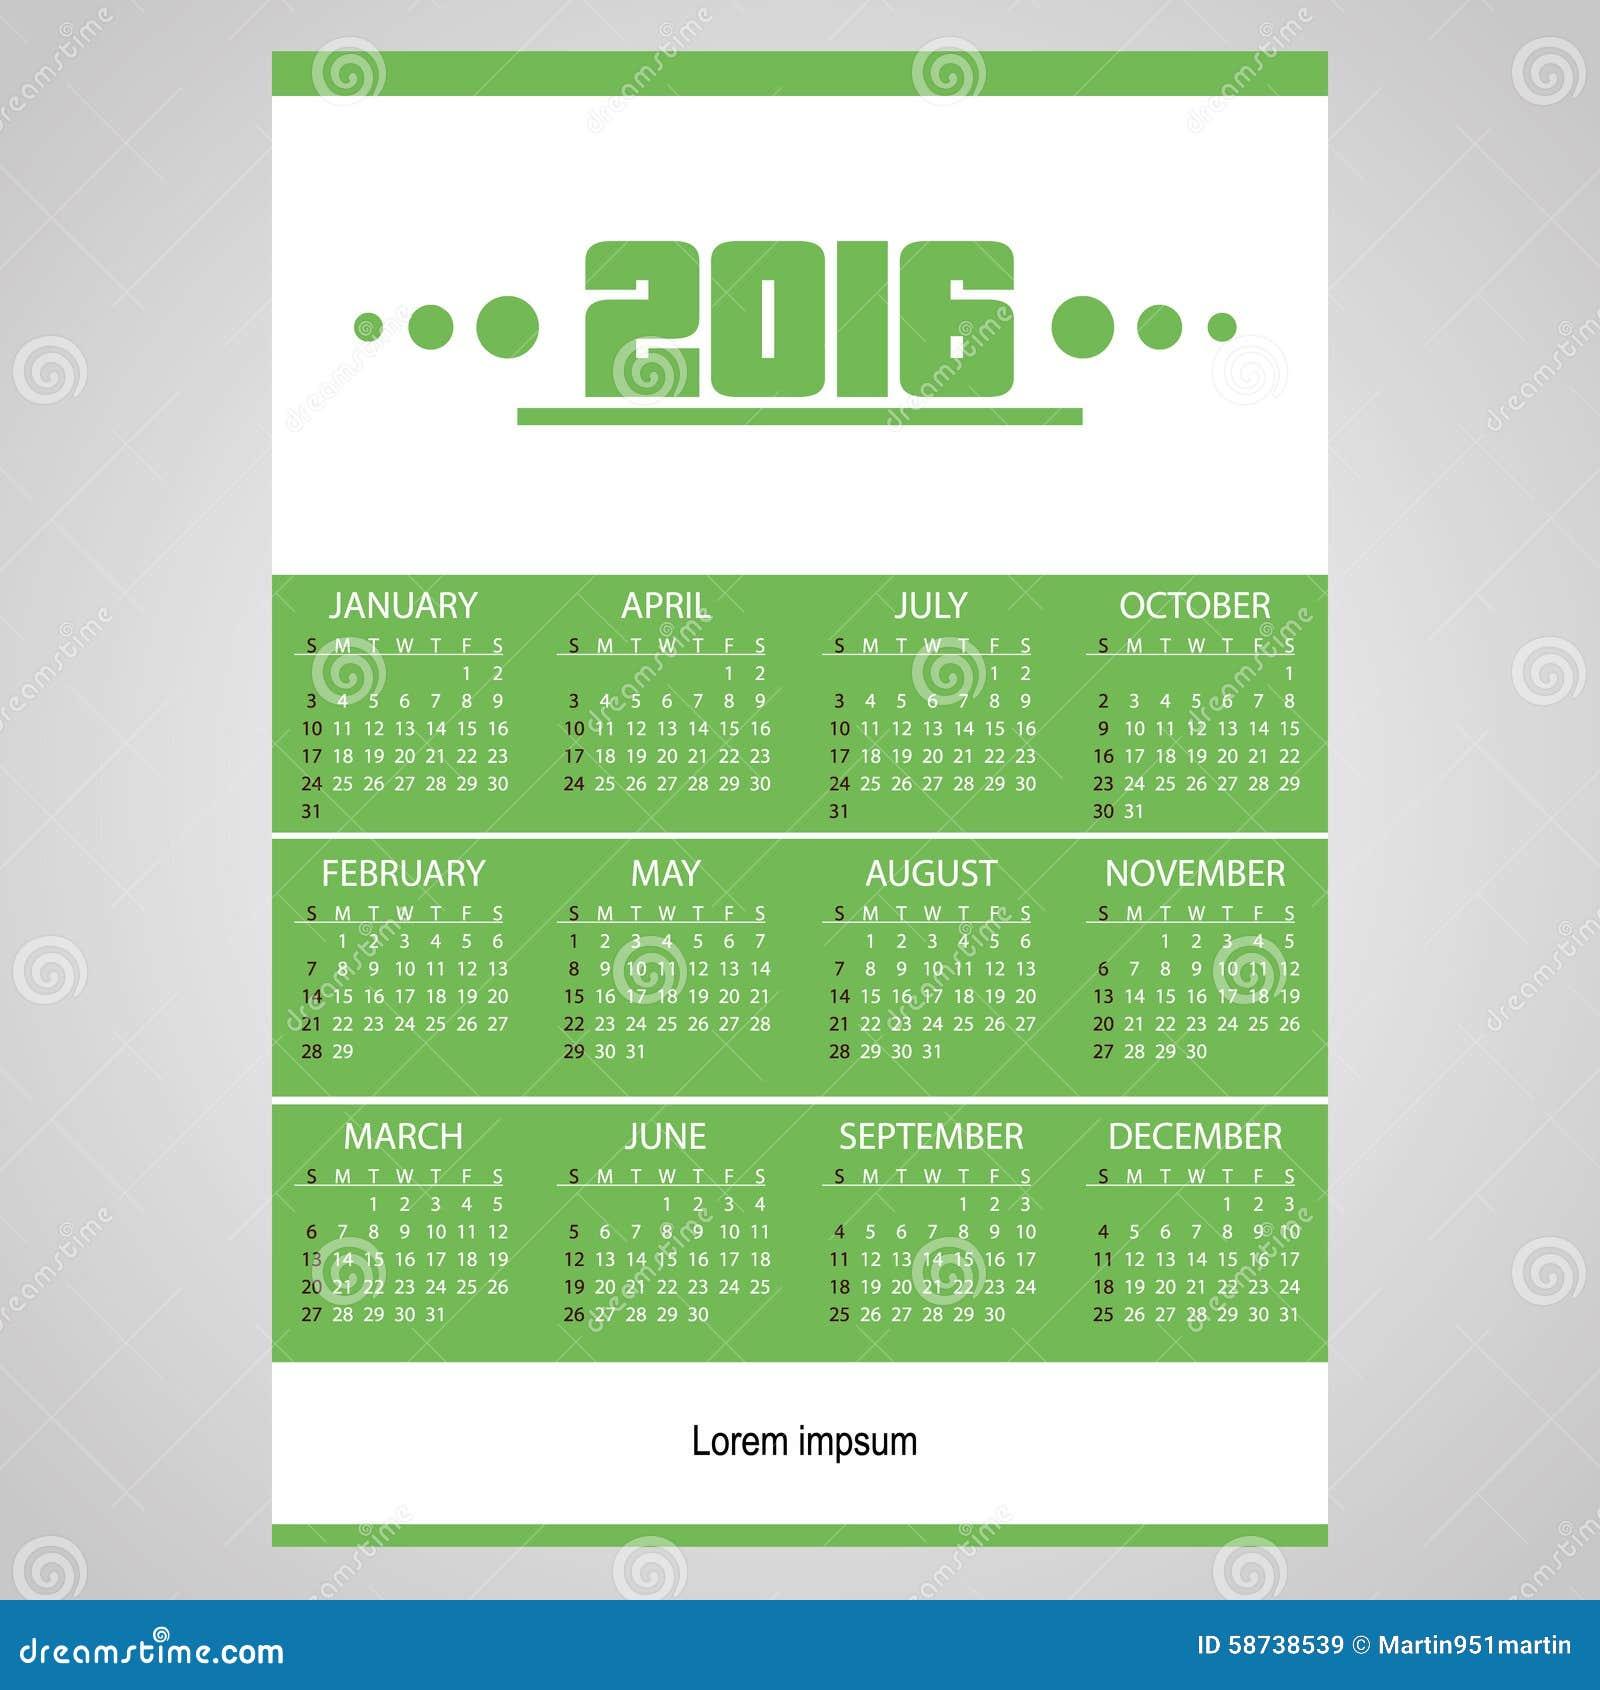 Calendar Green : Simple business wall calendar green and white eps